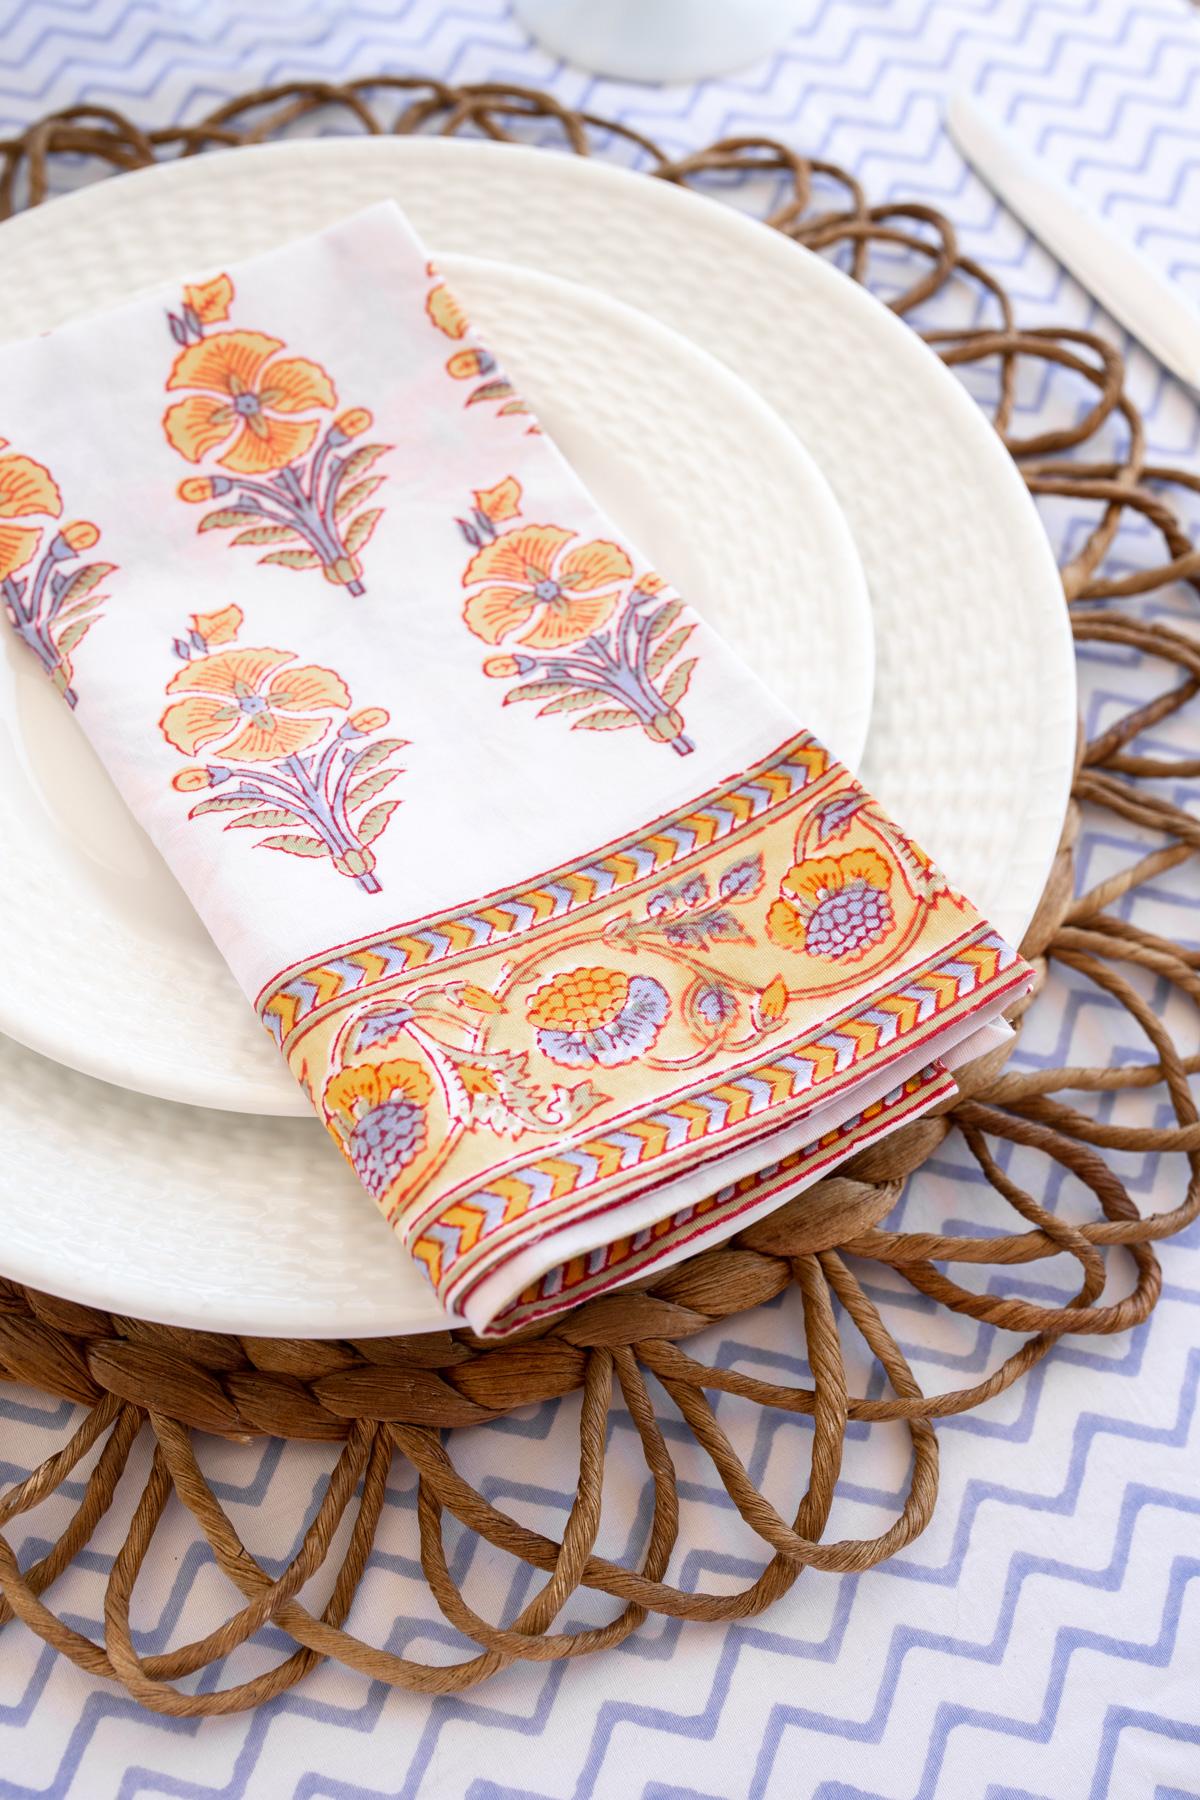 Stacie Flinner x Marigold Living Block Print Table Linens-8.jpg